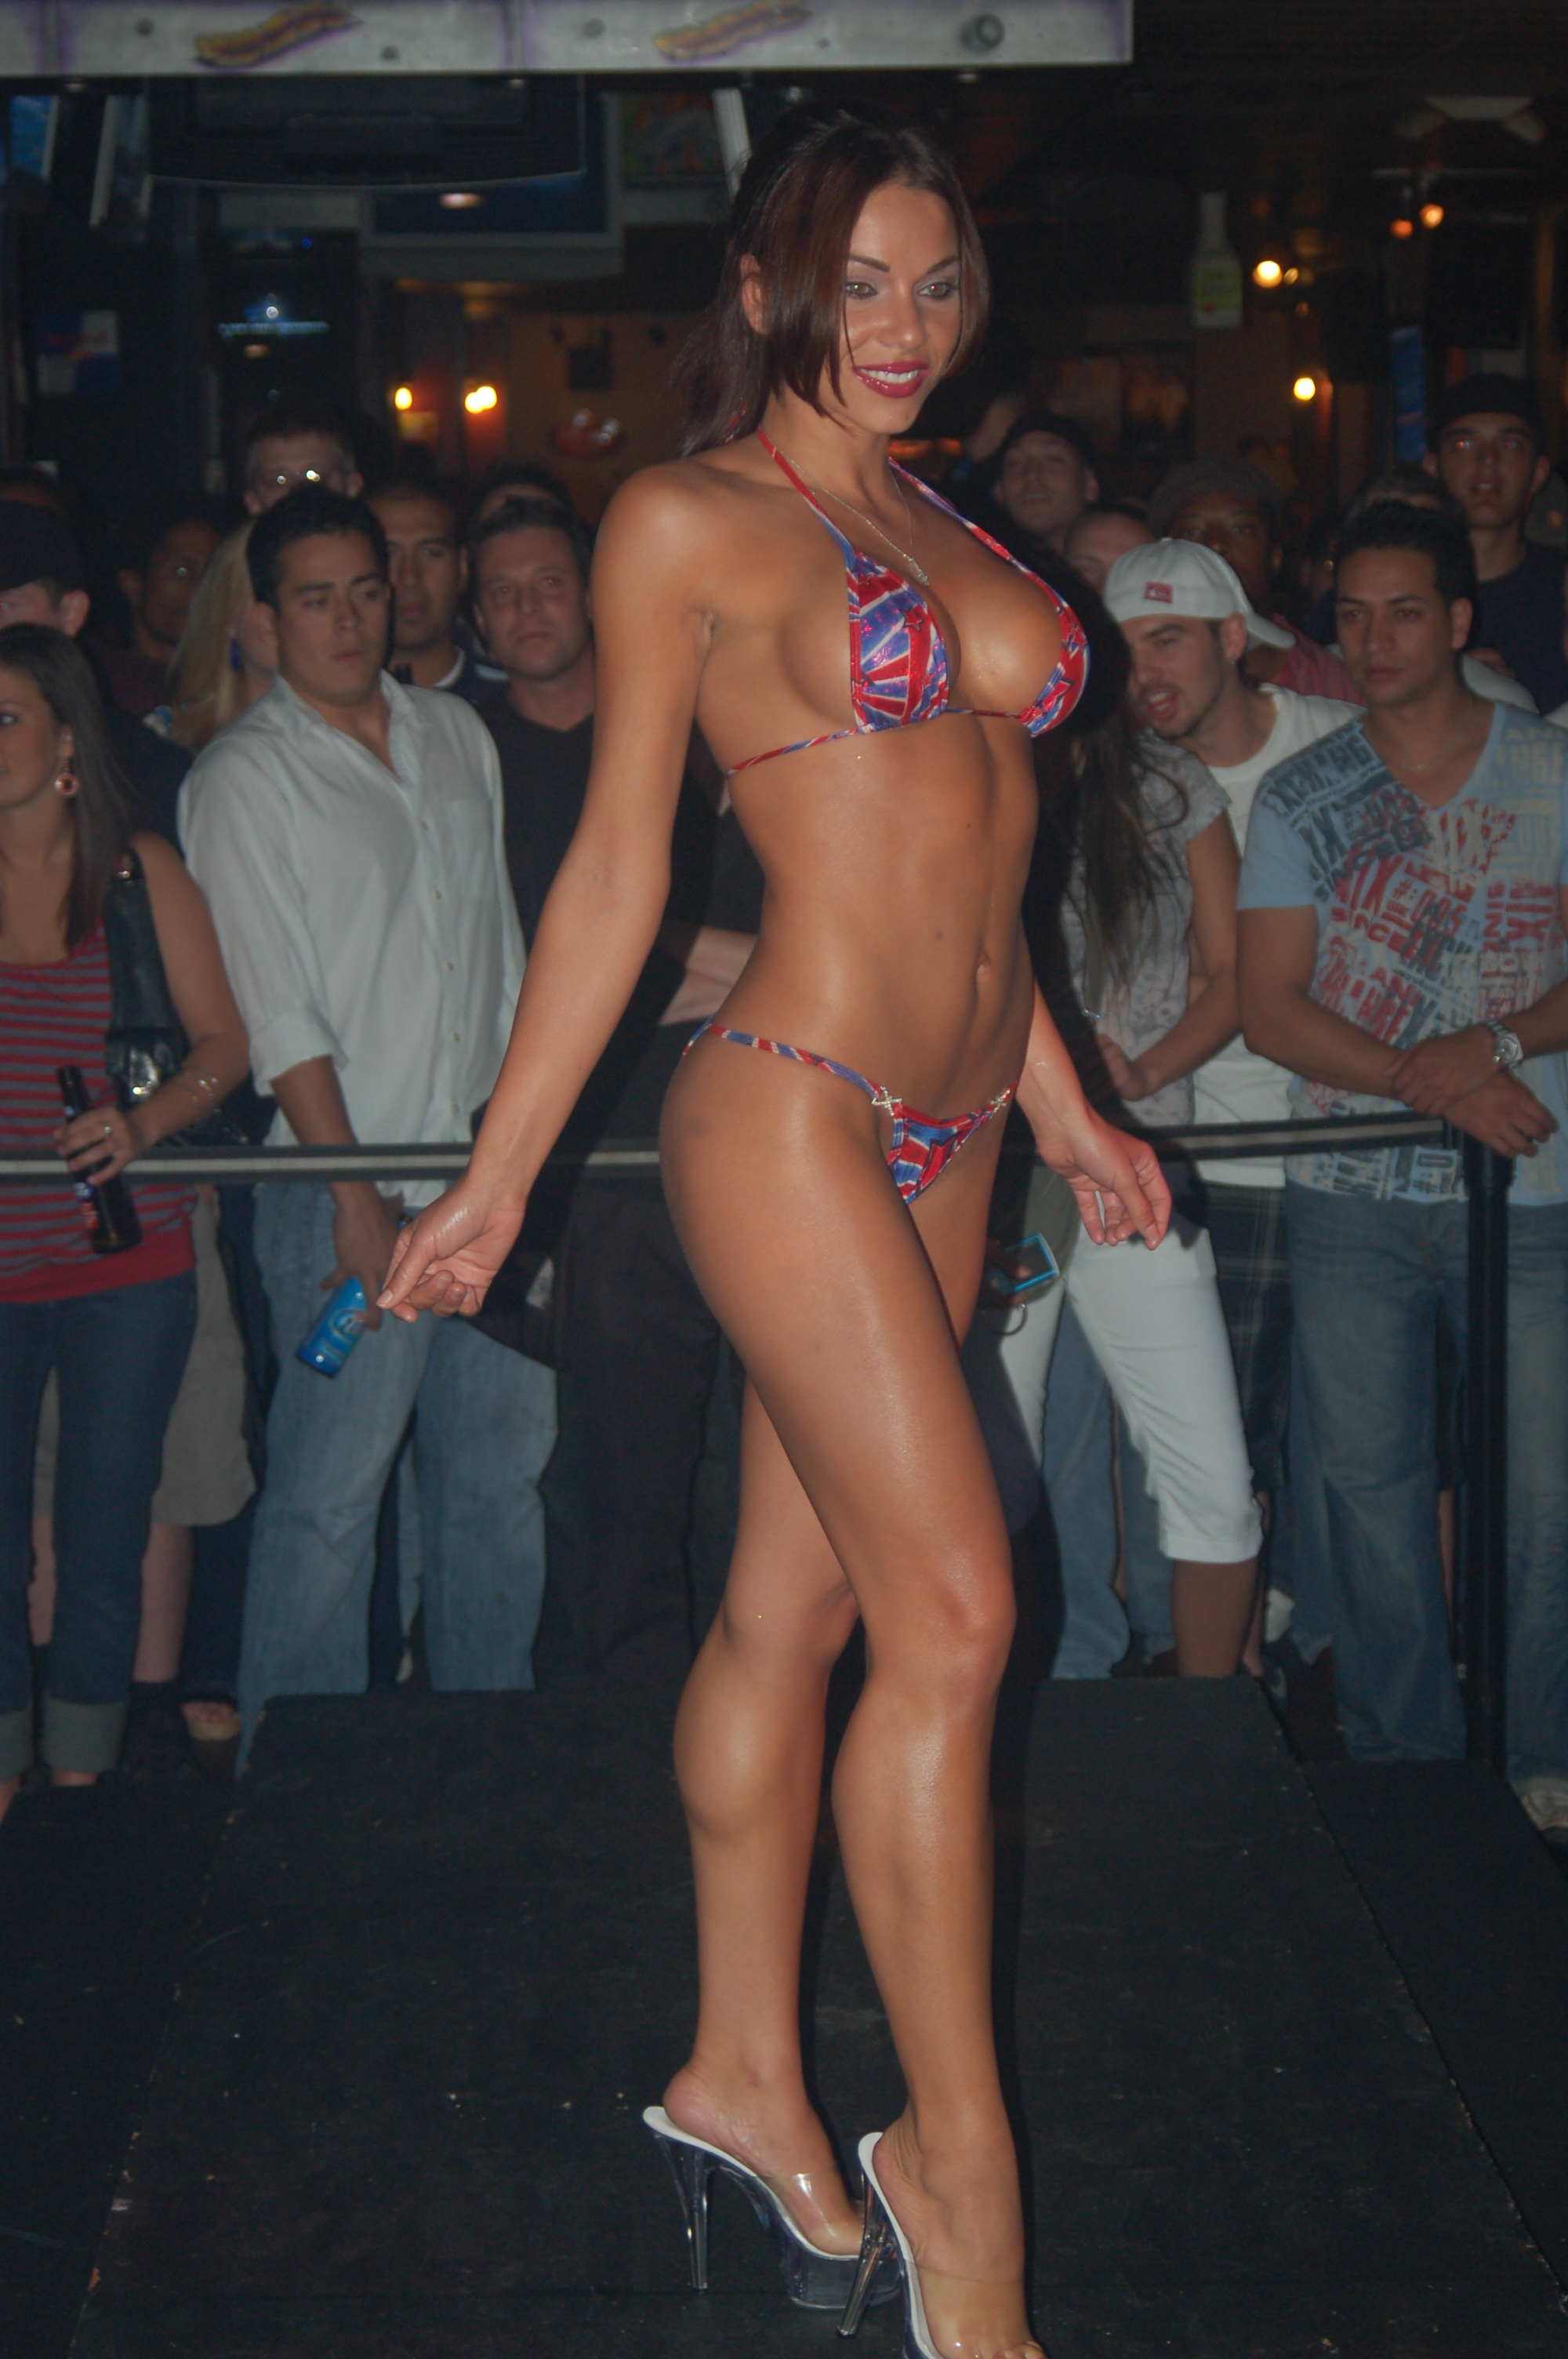 tall woman exercising naked